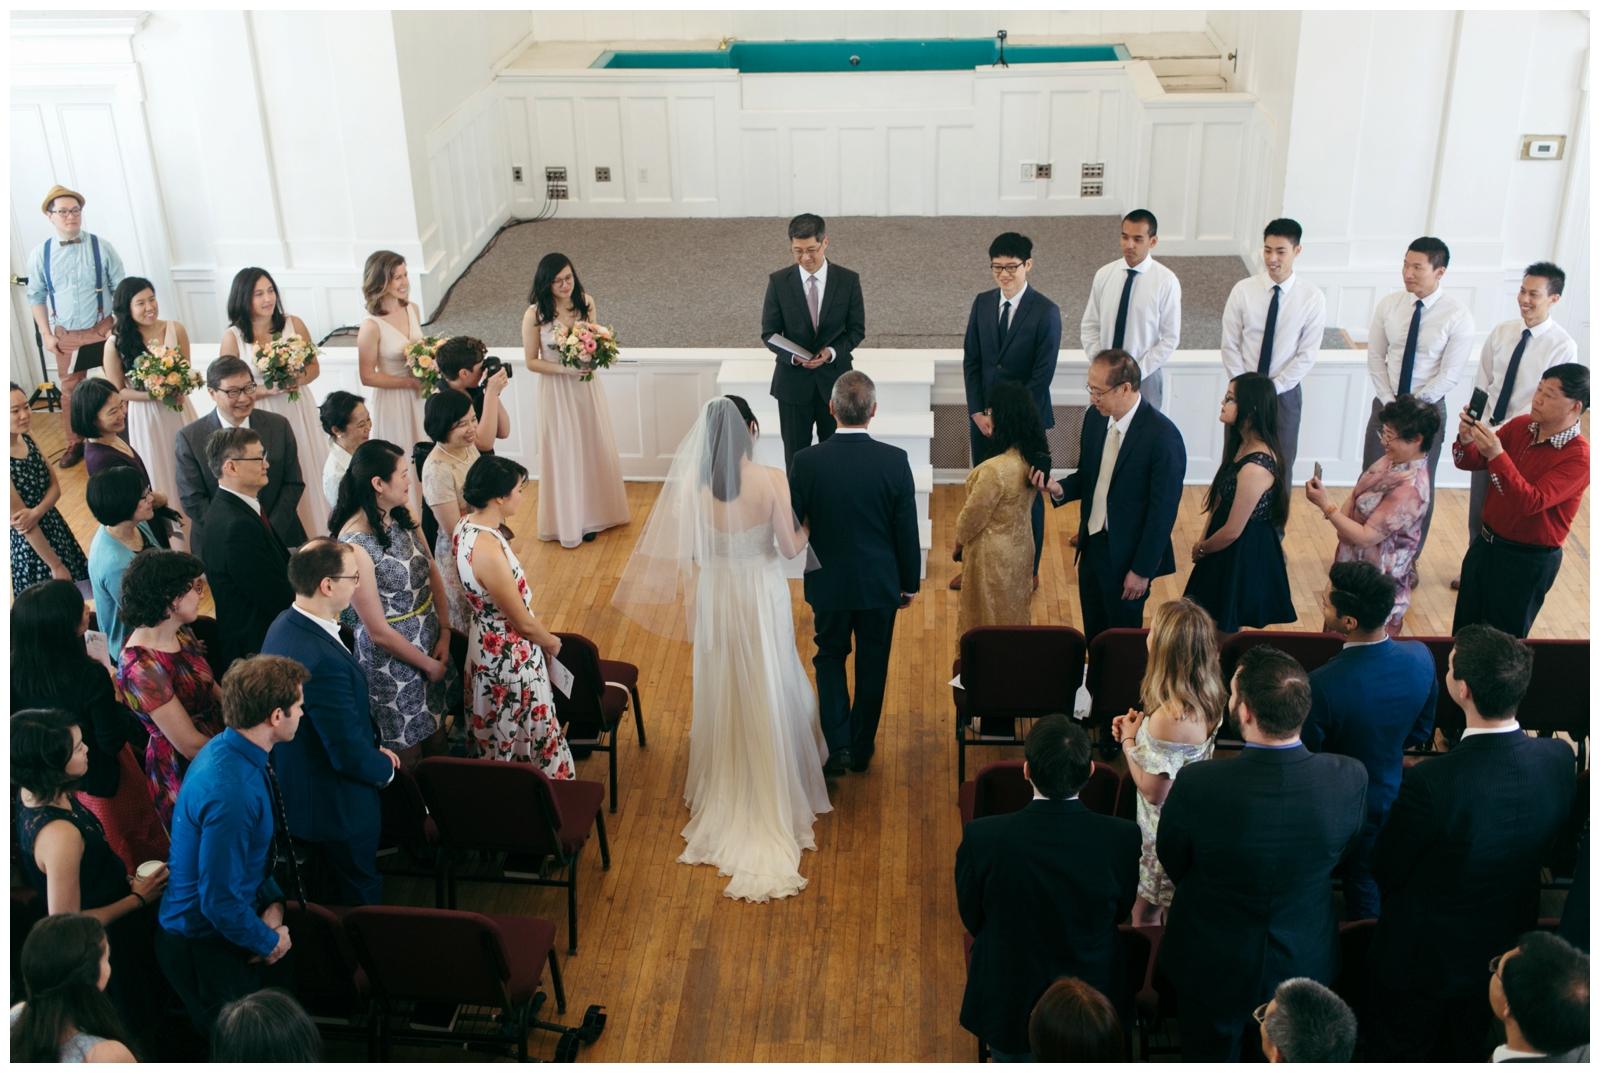 Samberg-Conference-Center-Boston-Wedding-Photographer-Bailey-Q-Photo-045.jpg